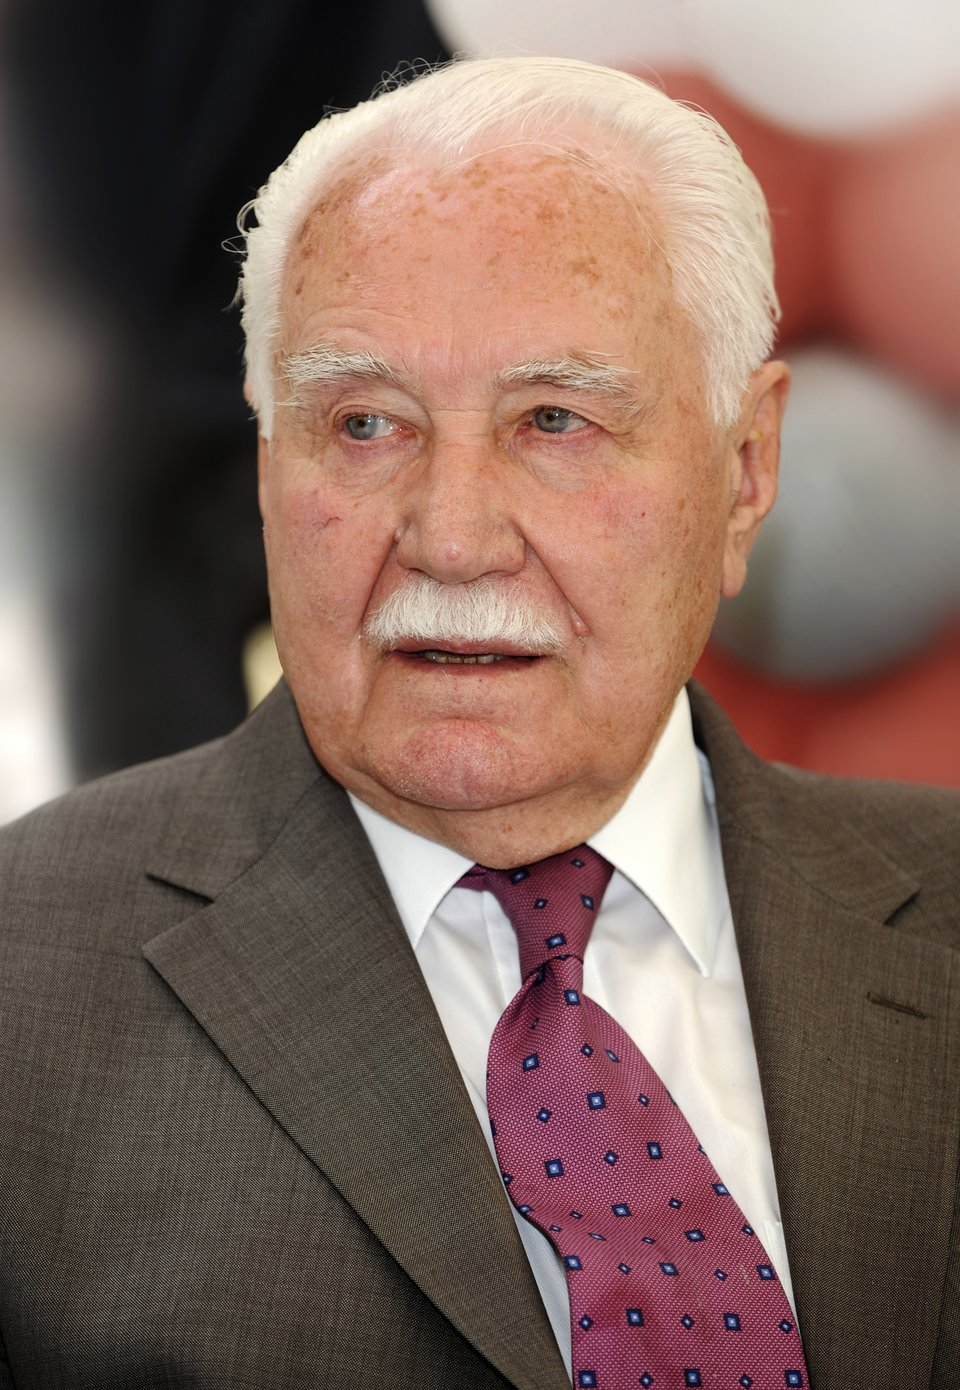 RyszardKaczorowski